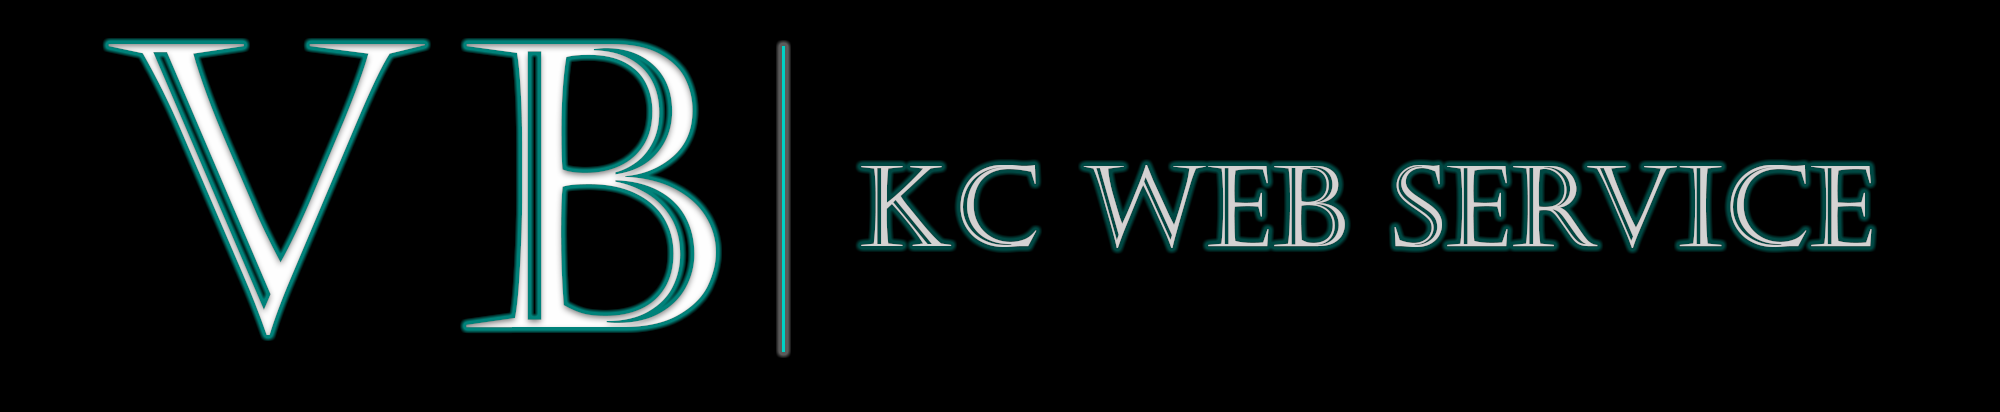 KC-Web-Service-3